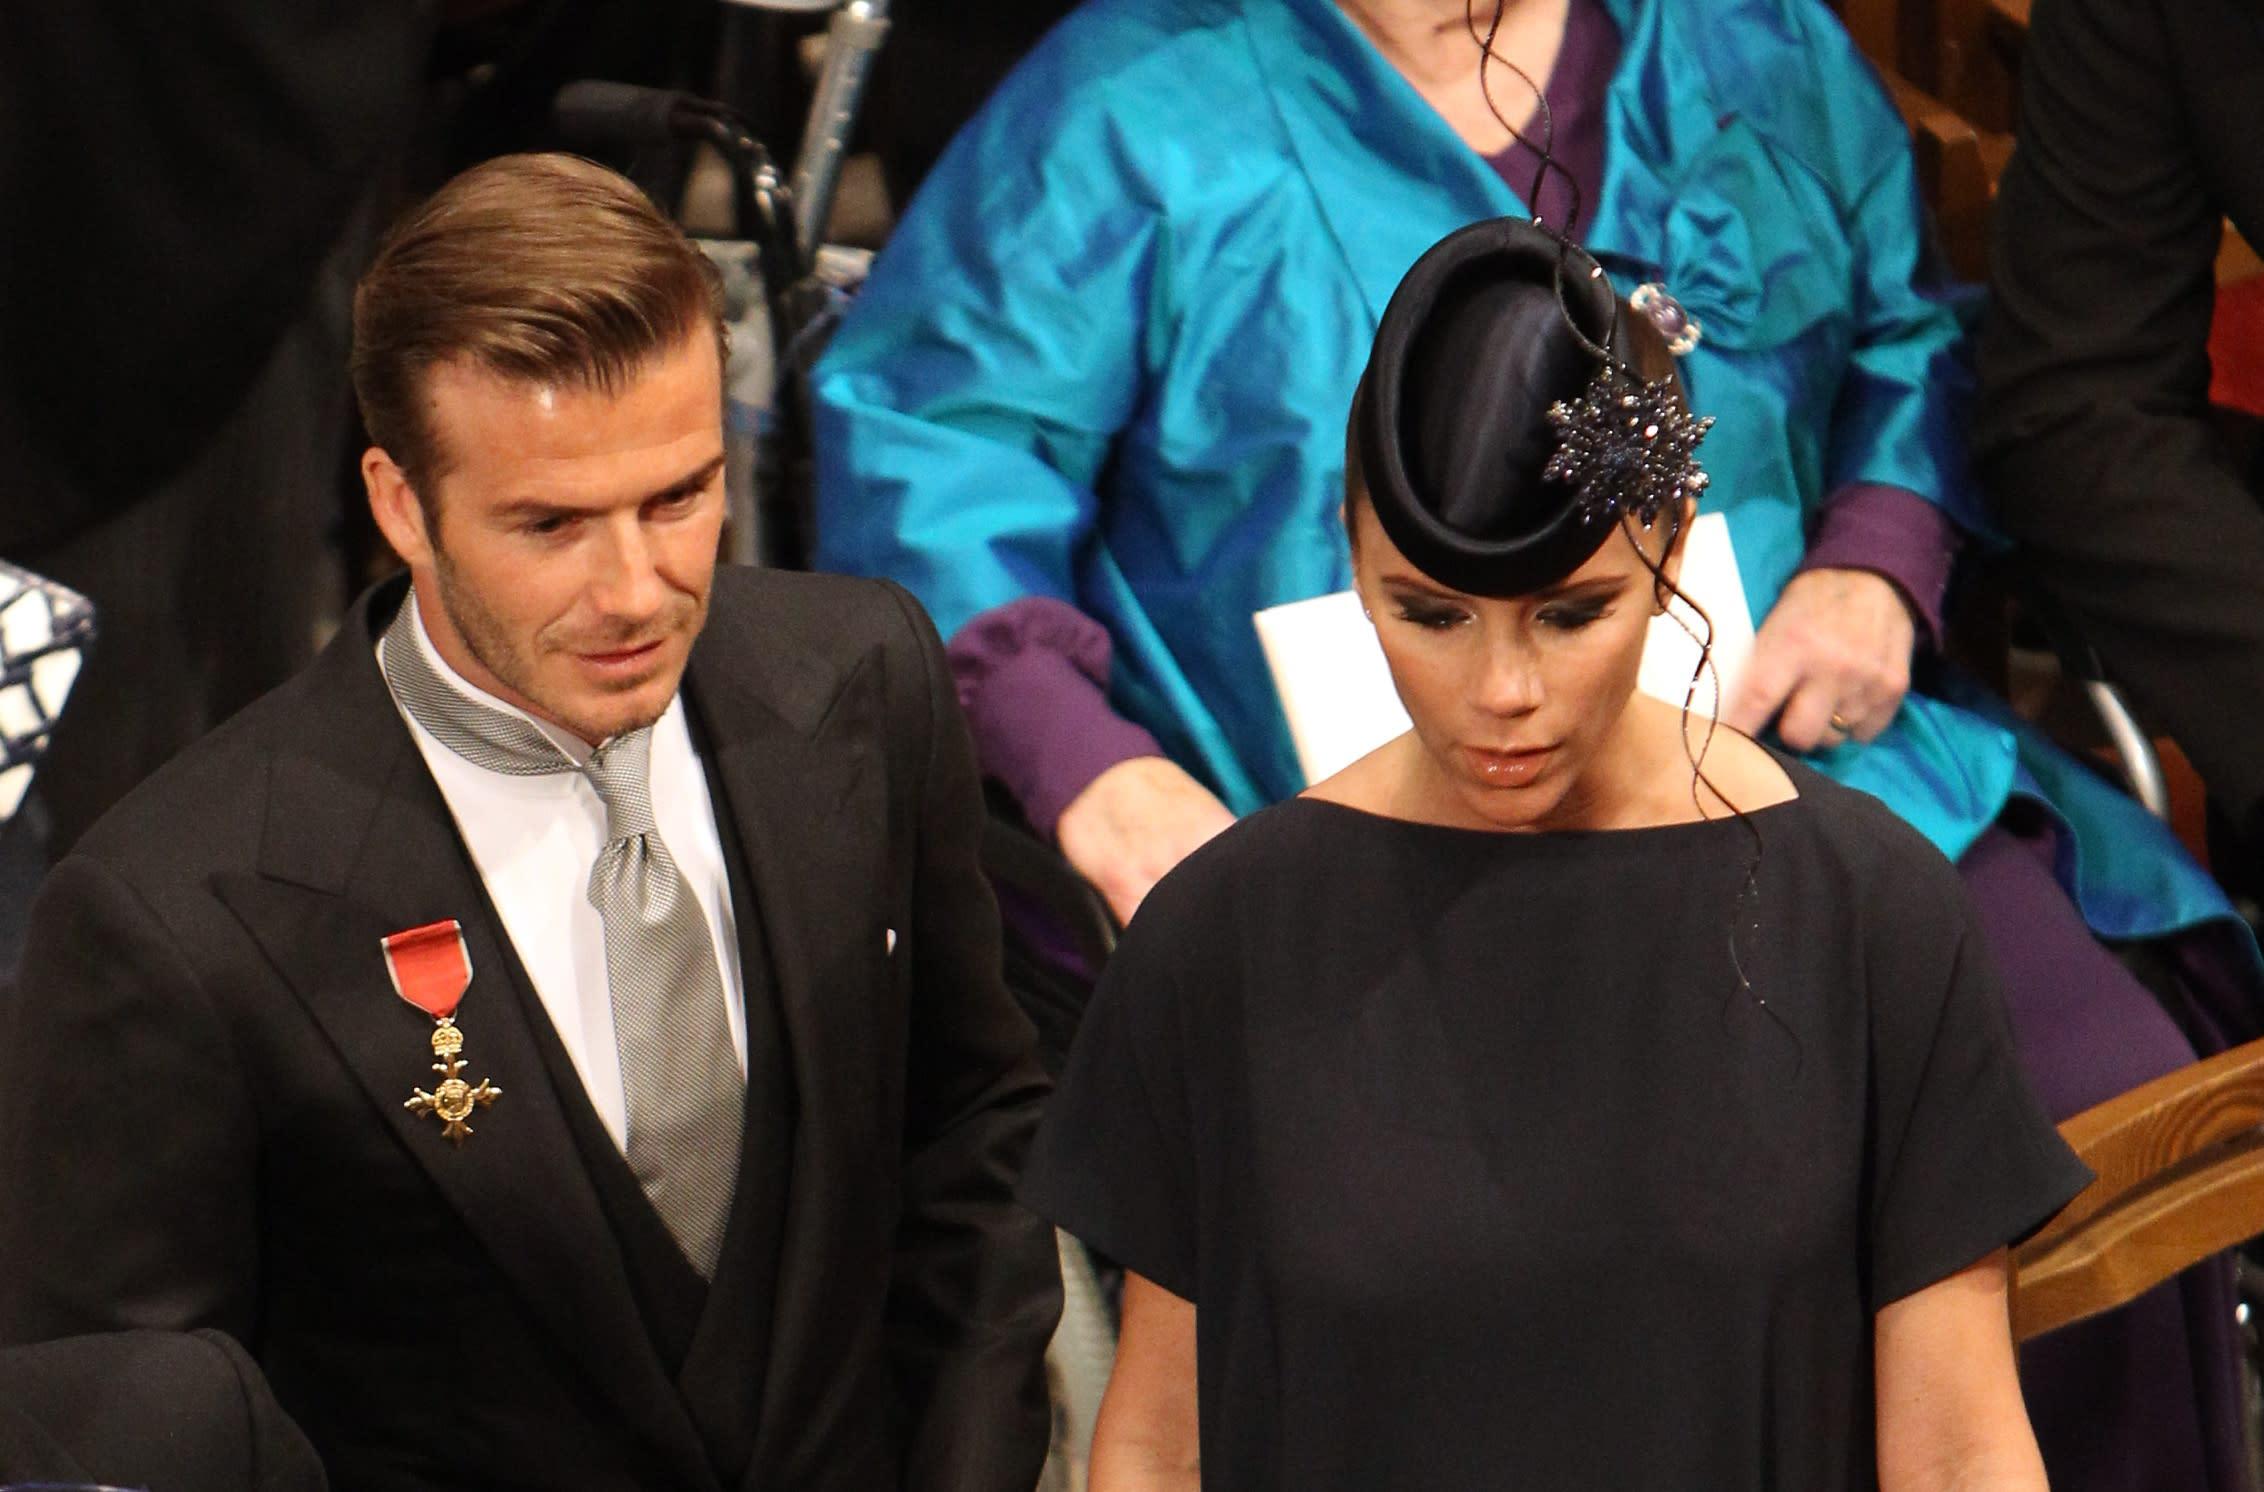 Victoria Beckham And David Beckham Just Graced The Royal Wedding